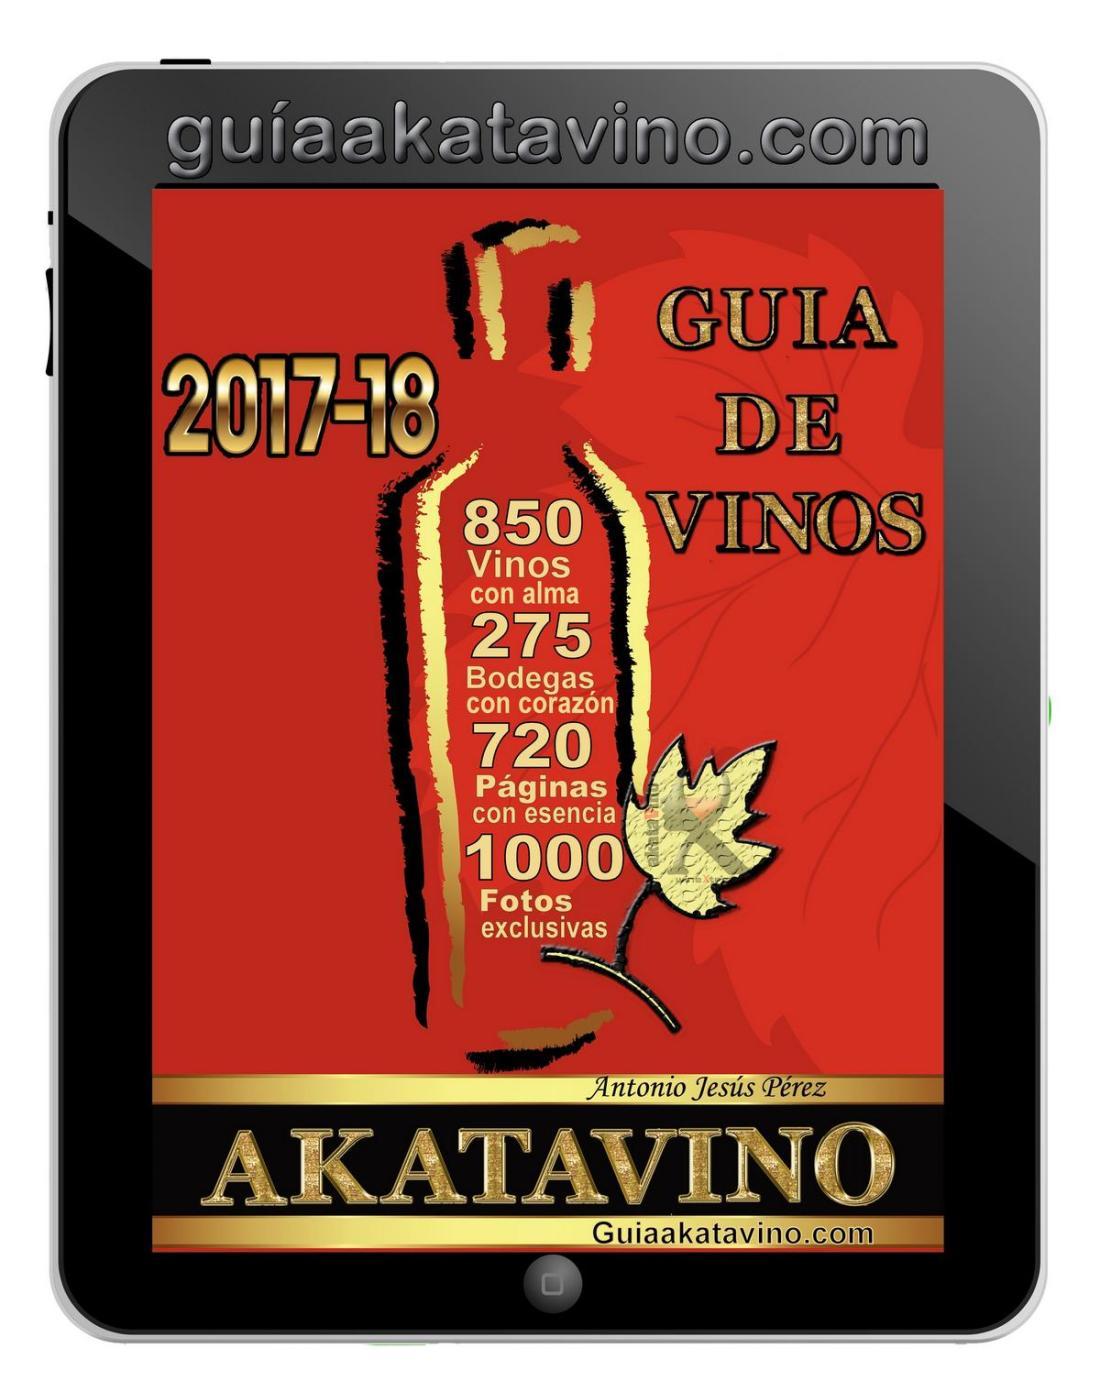 Portada Guia AkataVino 2017 2018 v2 © Guiaakatavino.com